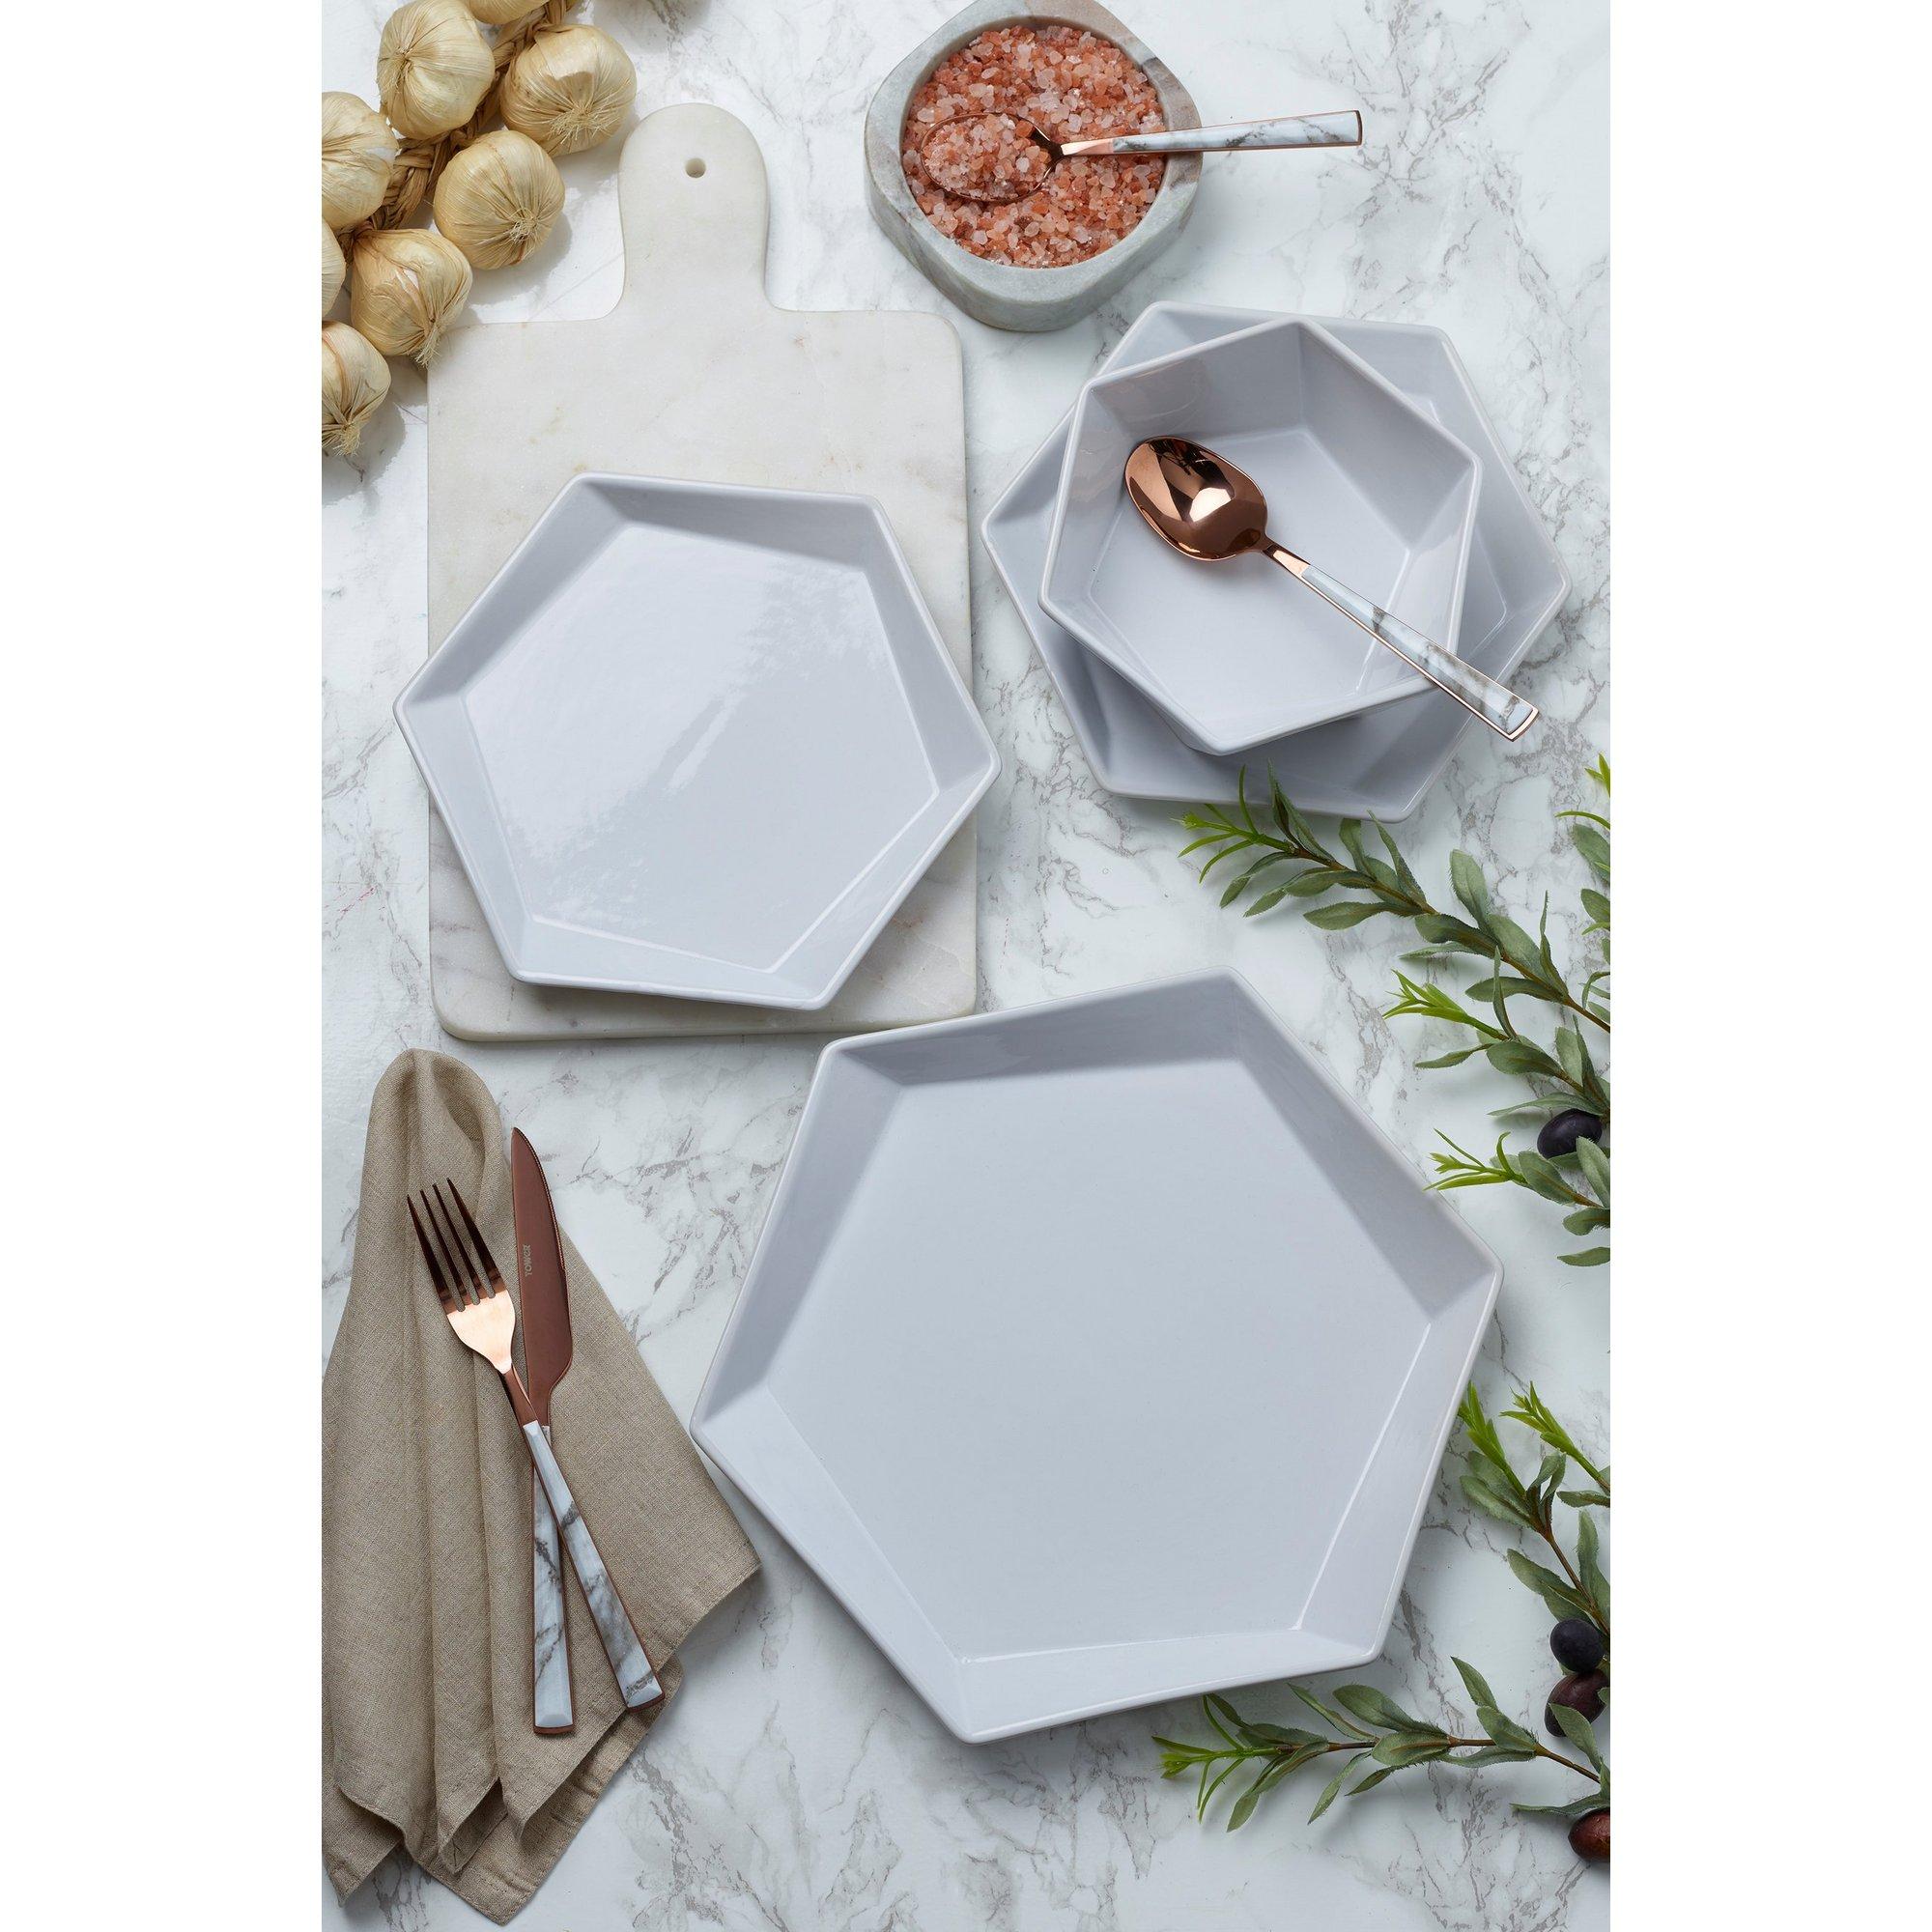 Image of 12-Piece Hexagonal Dinner Set